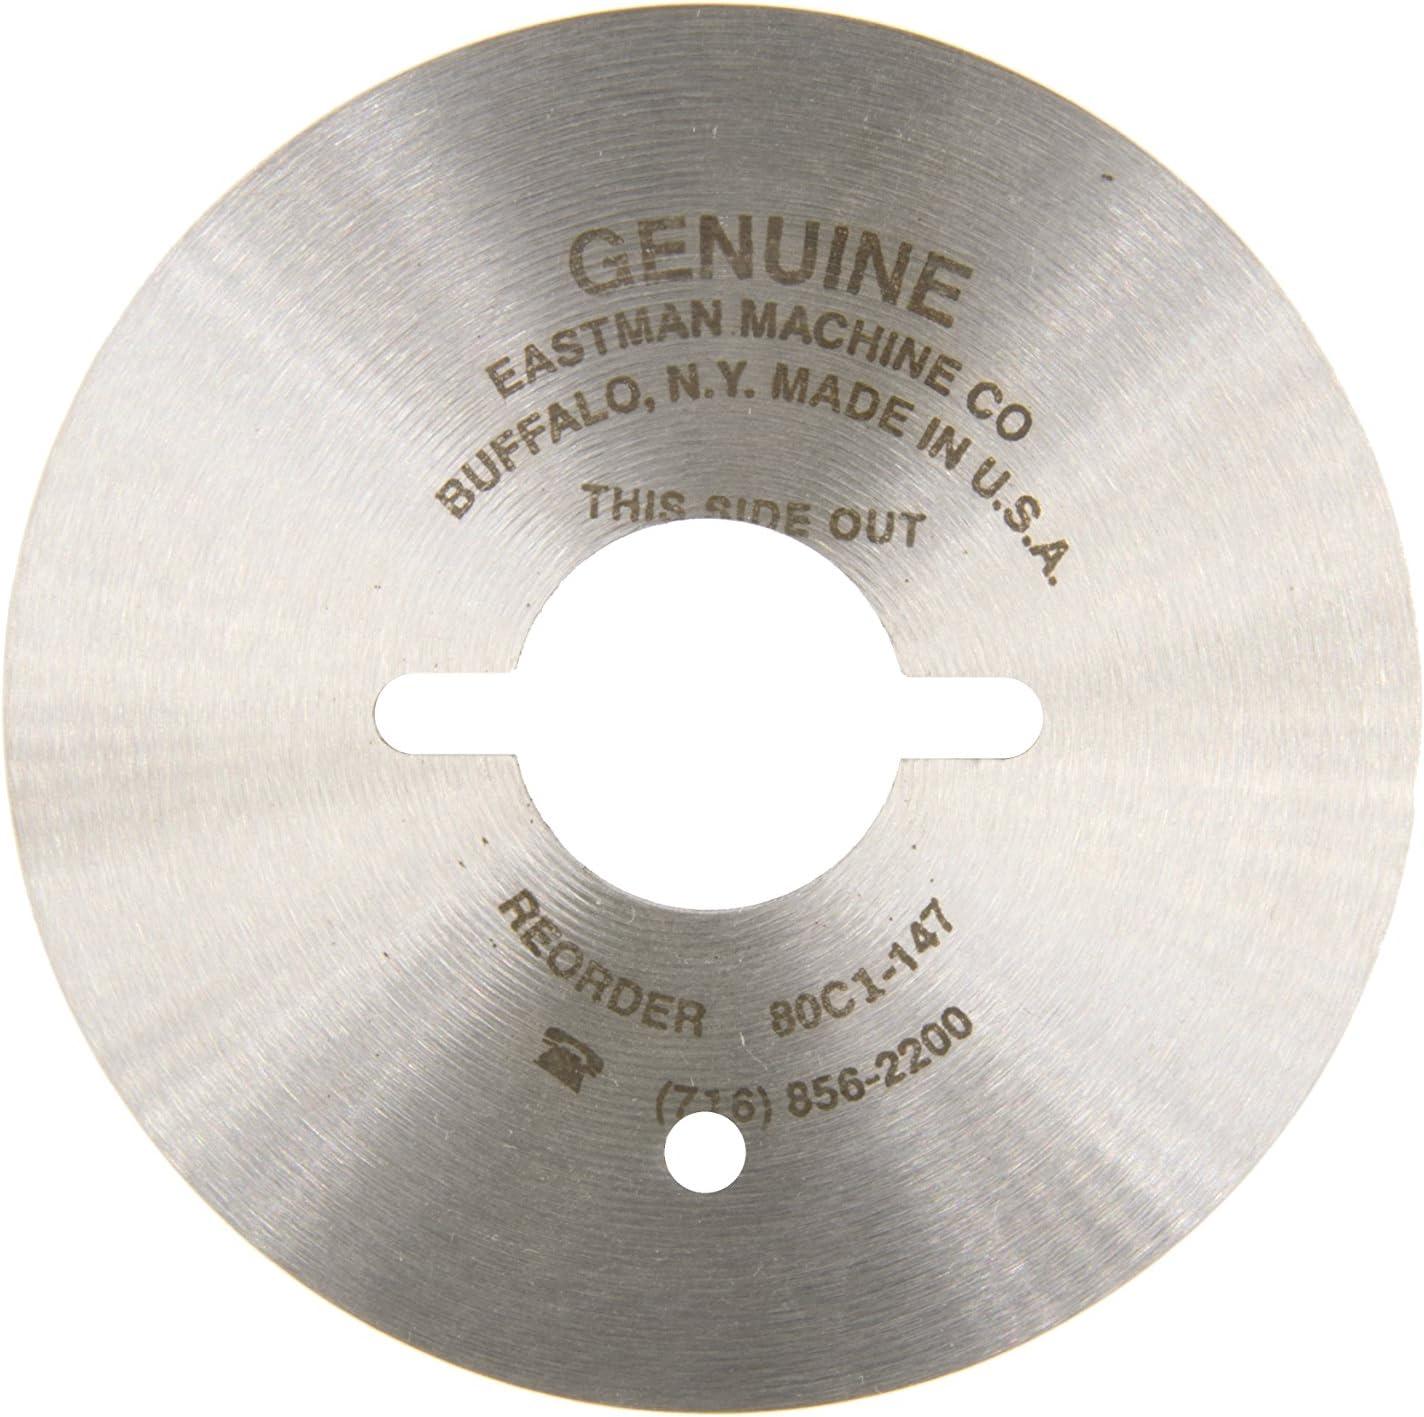 Round Blades 2 1//4 Inch for Eastman Chickadee D-2 D-2H Cutting Machine Genuine